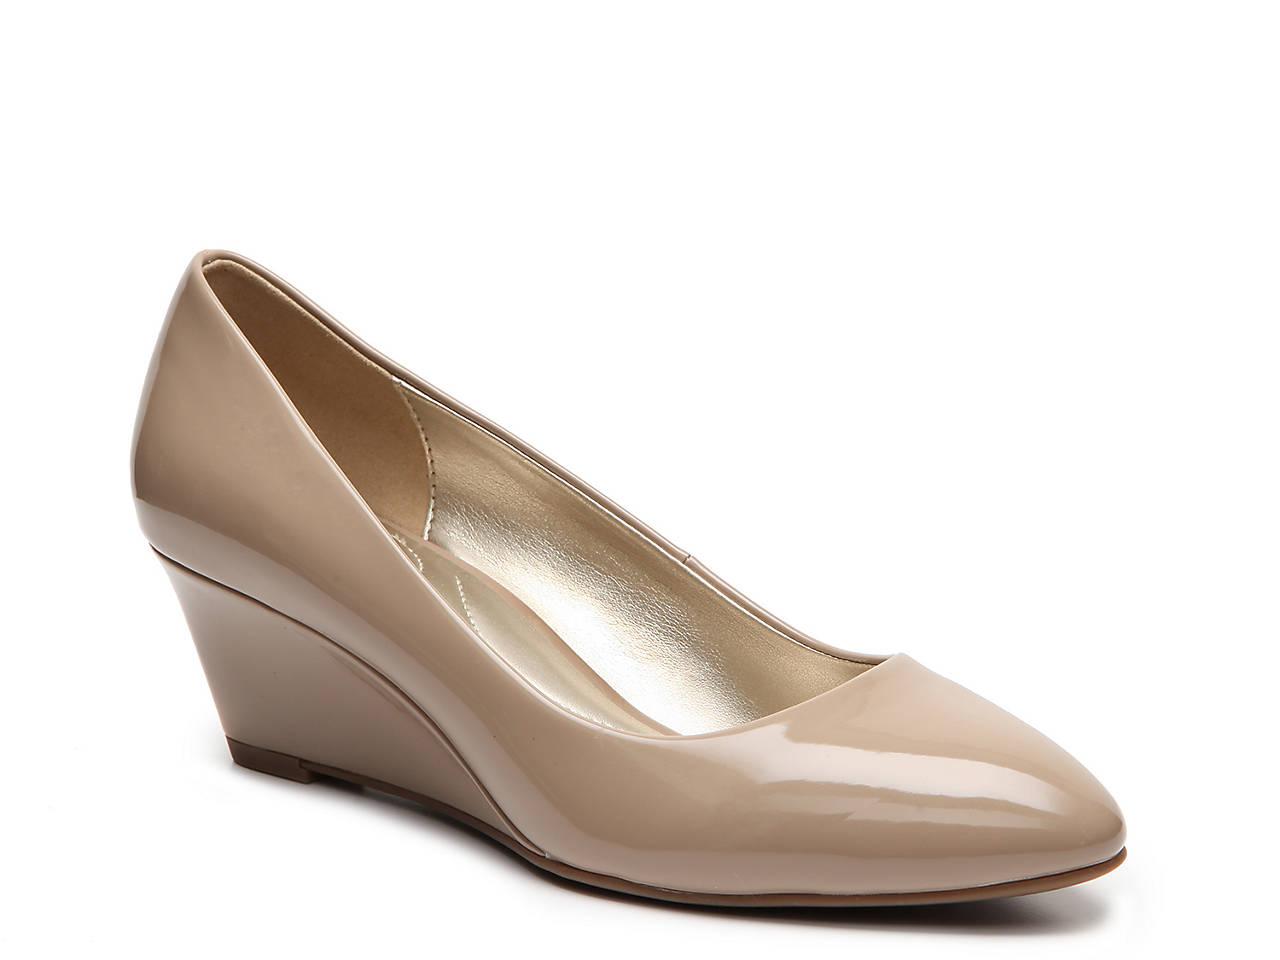 4924fc74951 Bandolino Franci Wedge Pump Women s Shoes